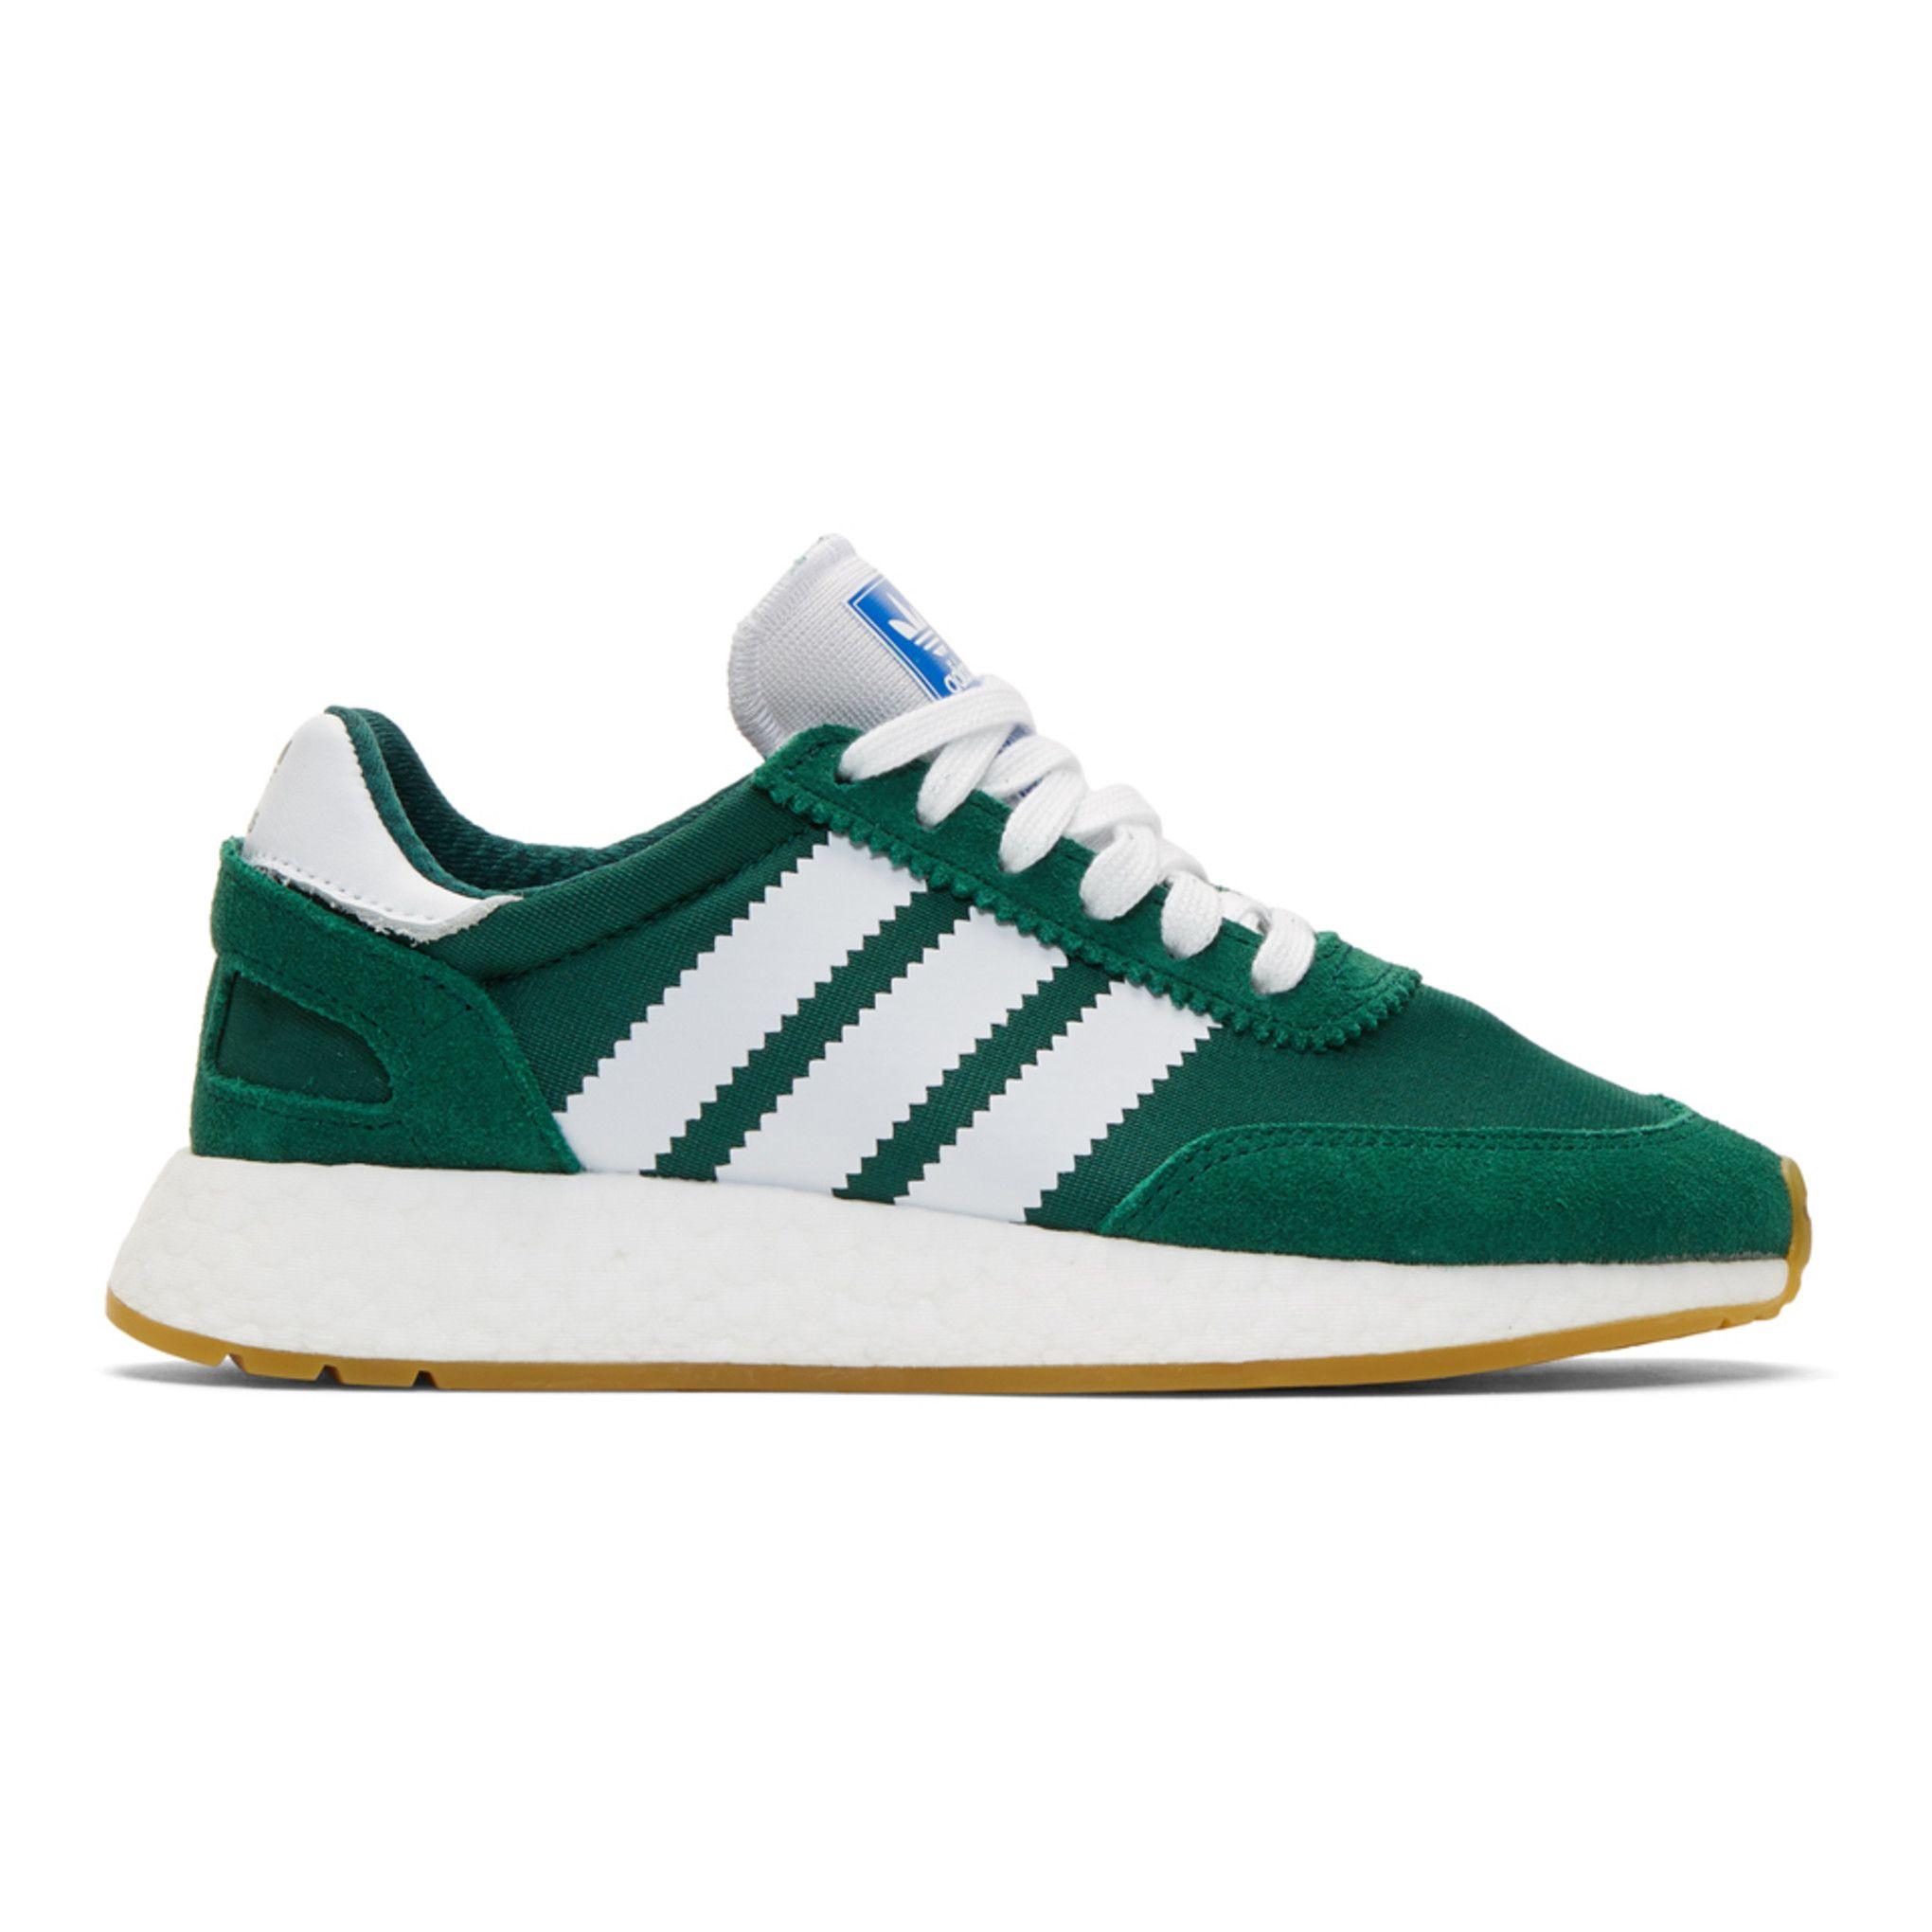 Adidas suede shoes, Adidas suede, Sneakers